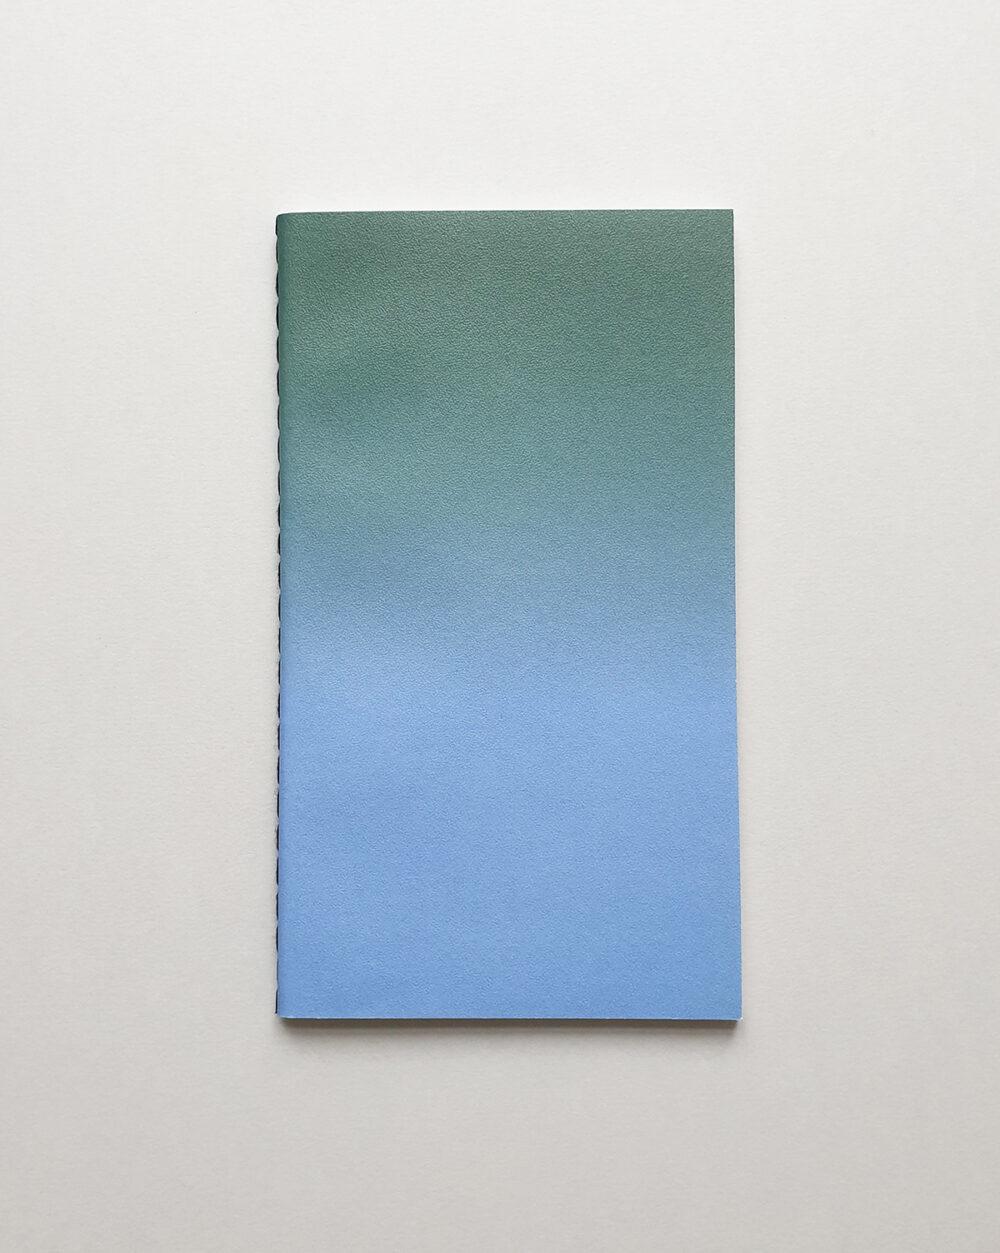 horizon small green blue notebook